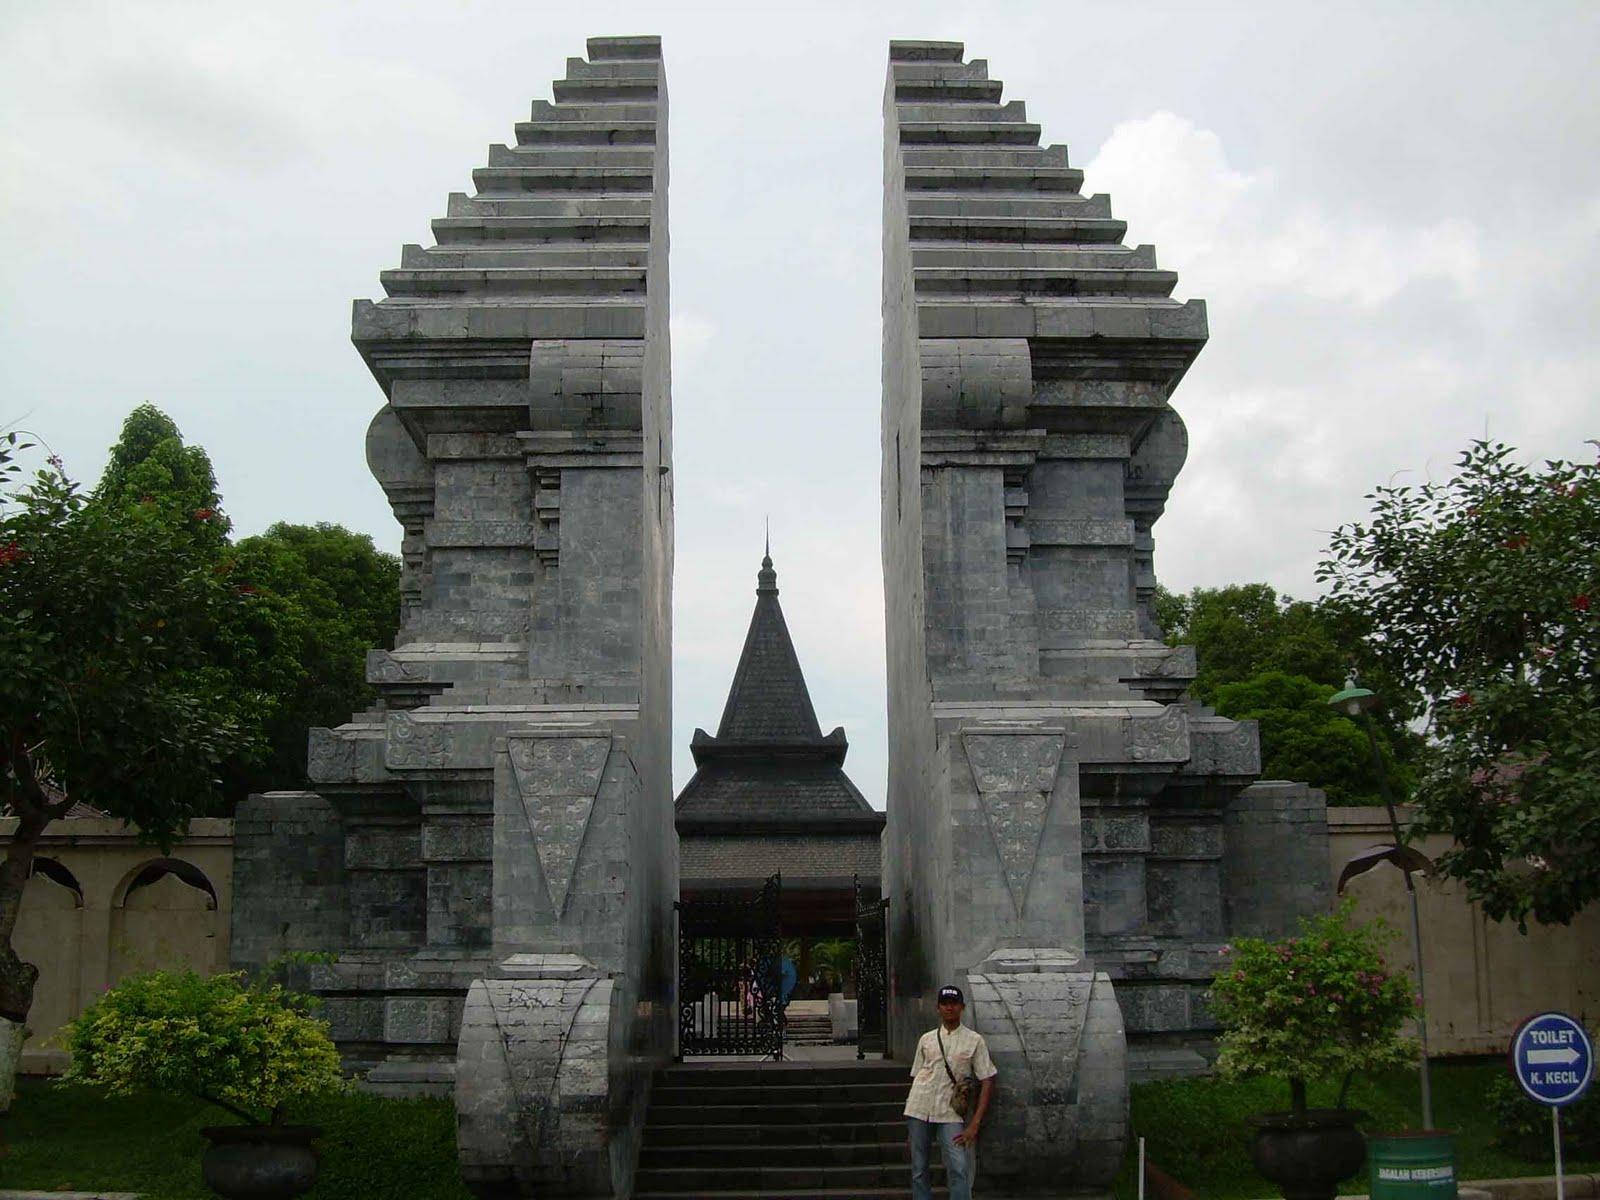 Potensi Pariwisata Kota Blitar Rifanputra Tidak Lepas Nilai Sejarah Antara